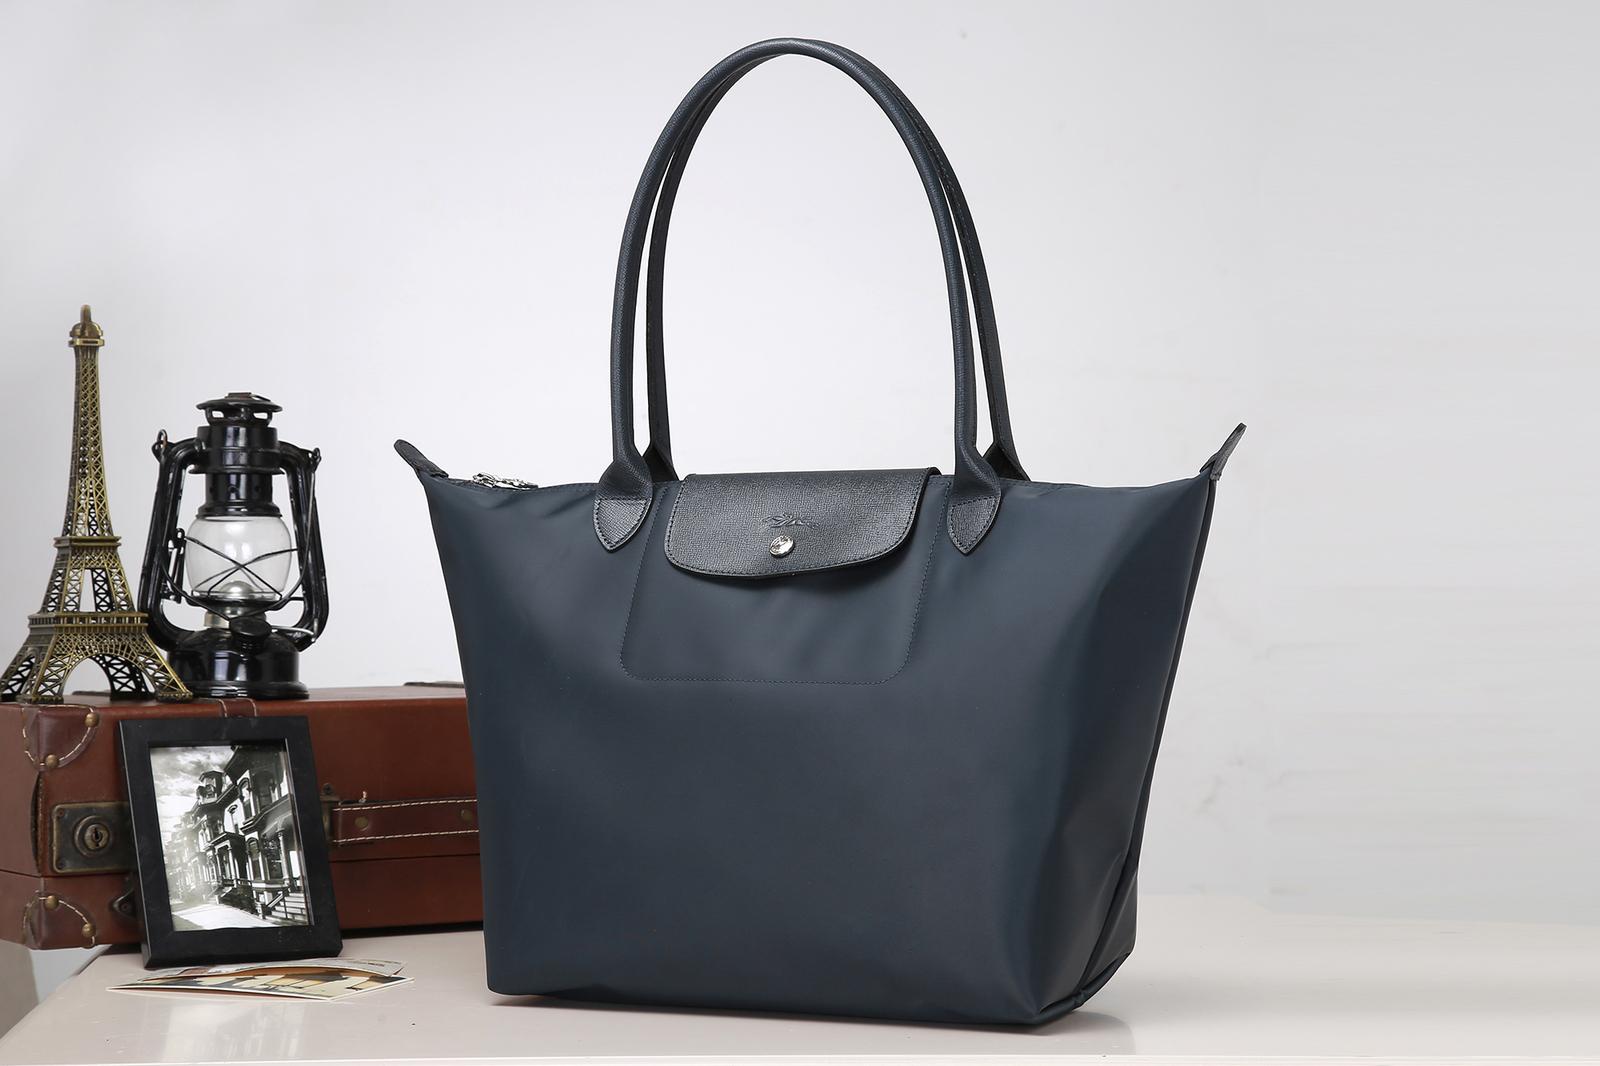 4d6a28daf51f3 Longchamp le pliage handbag neo tote large grey graphite nylon new 4